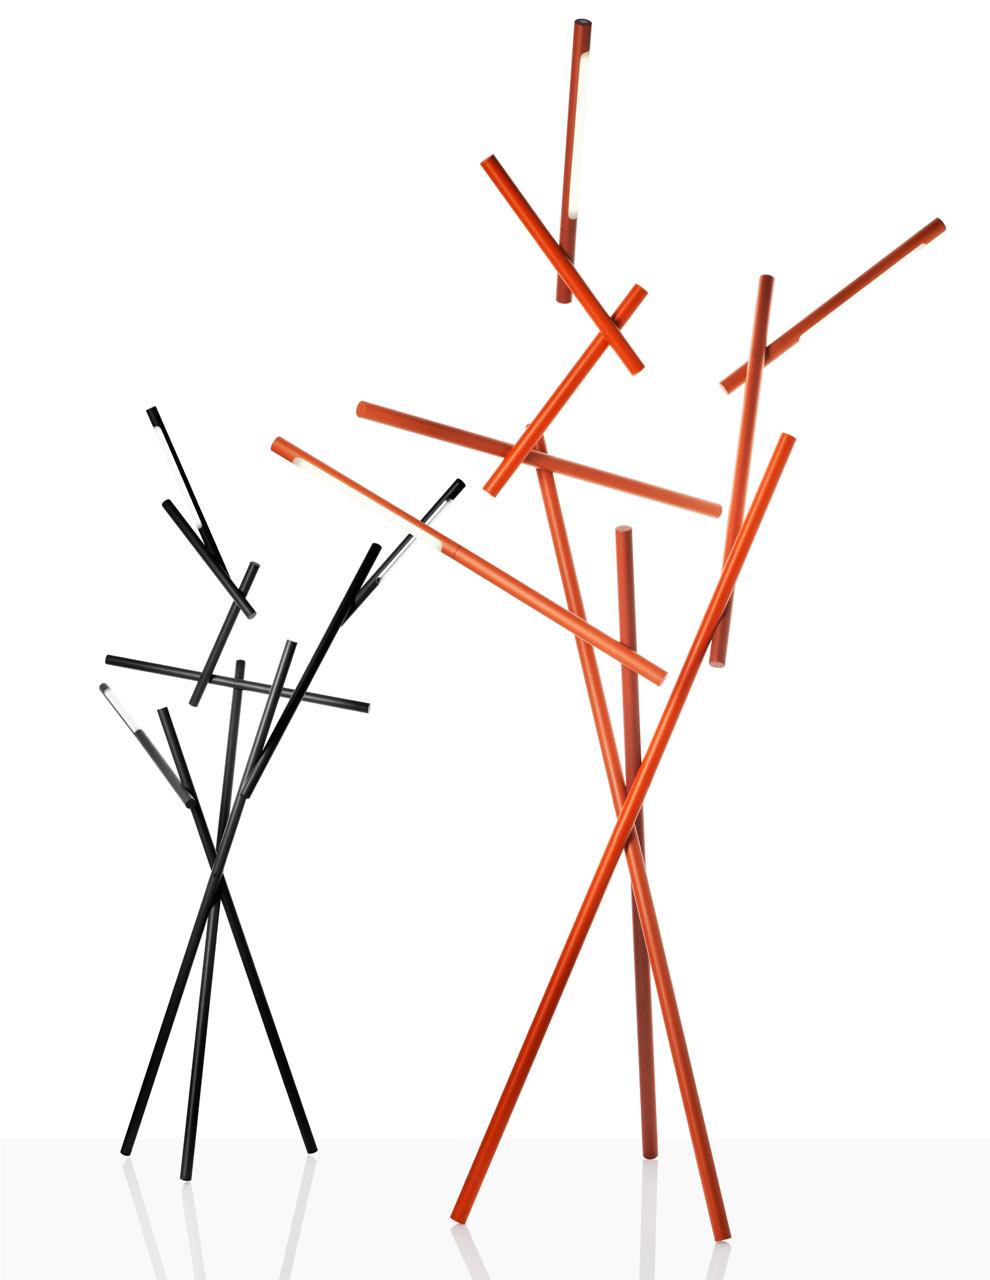 Tuareg: Architectural Branch-Like Lamps from Foscarini